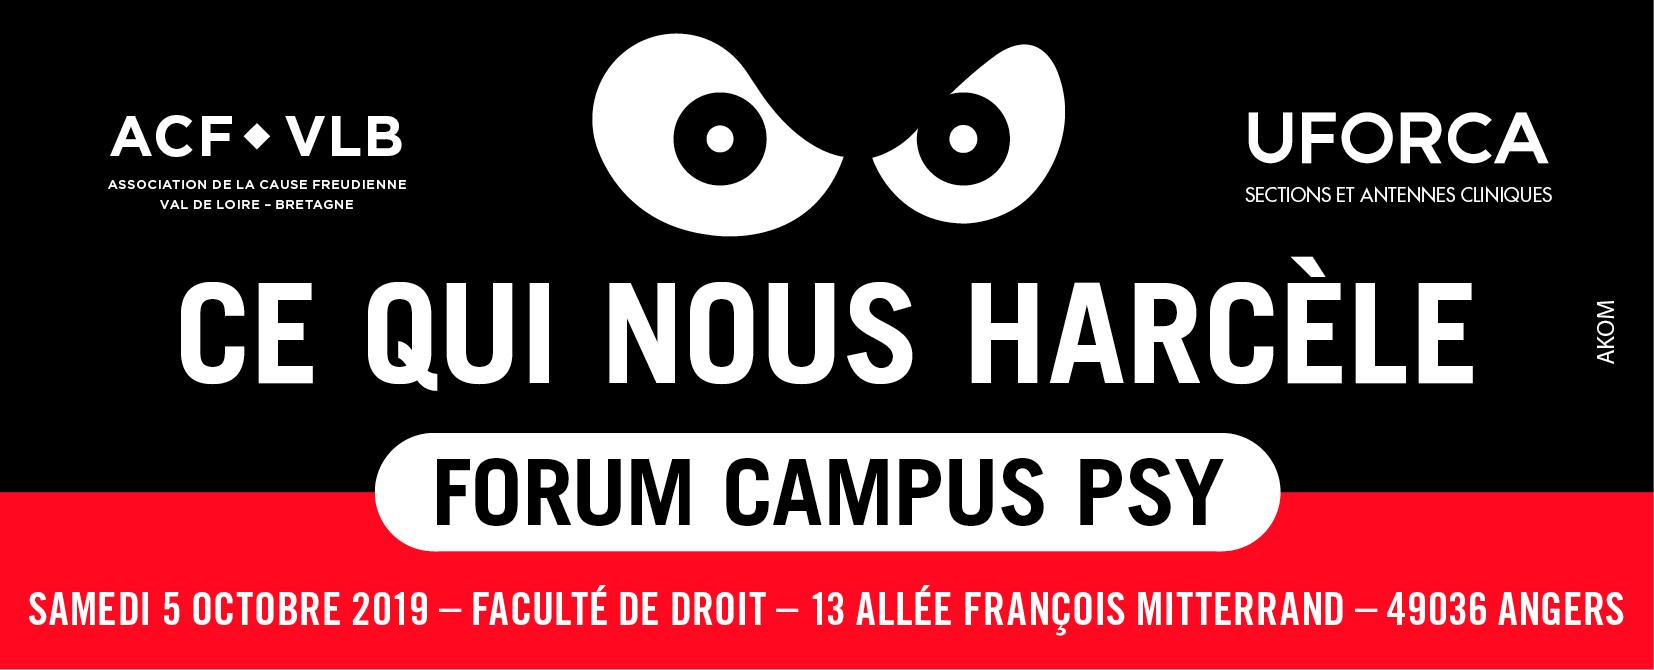 19-10-05 campus psy VLB bandeau